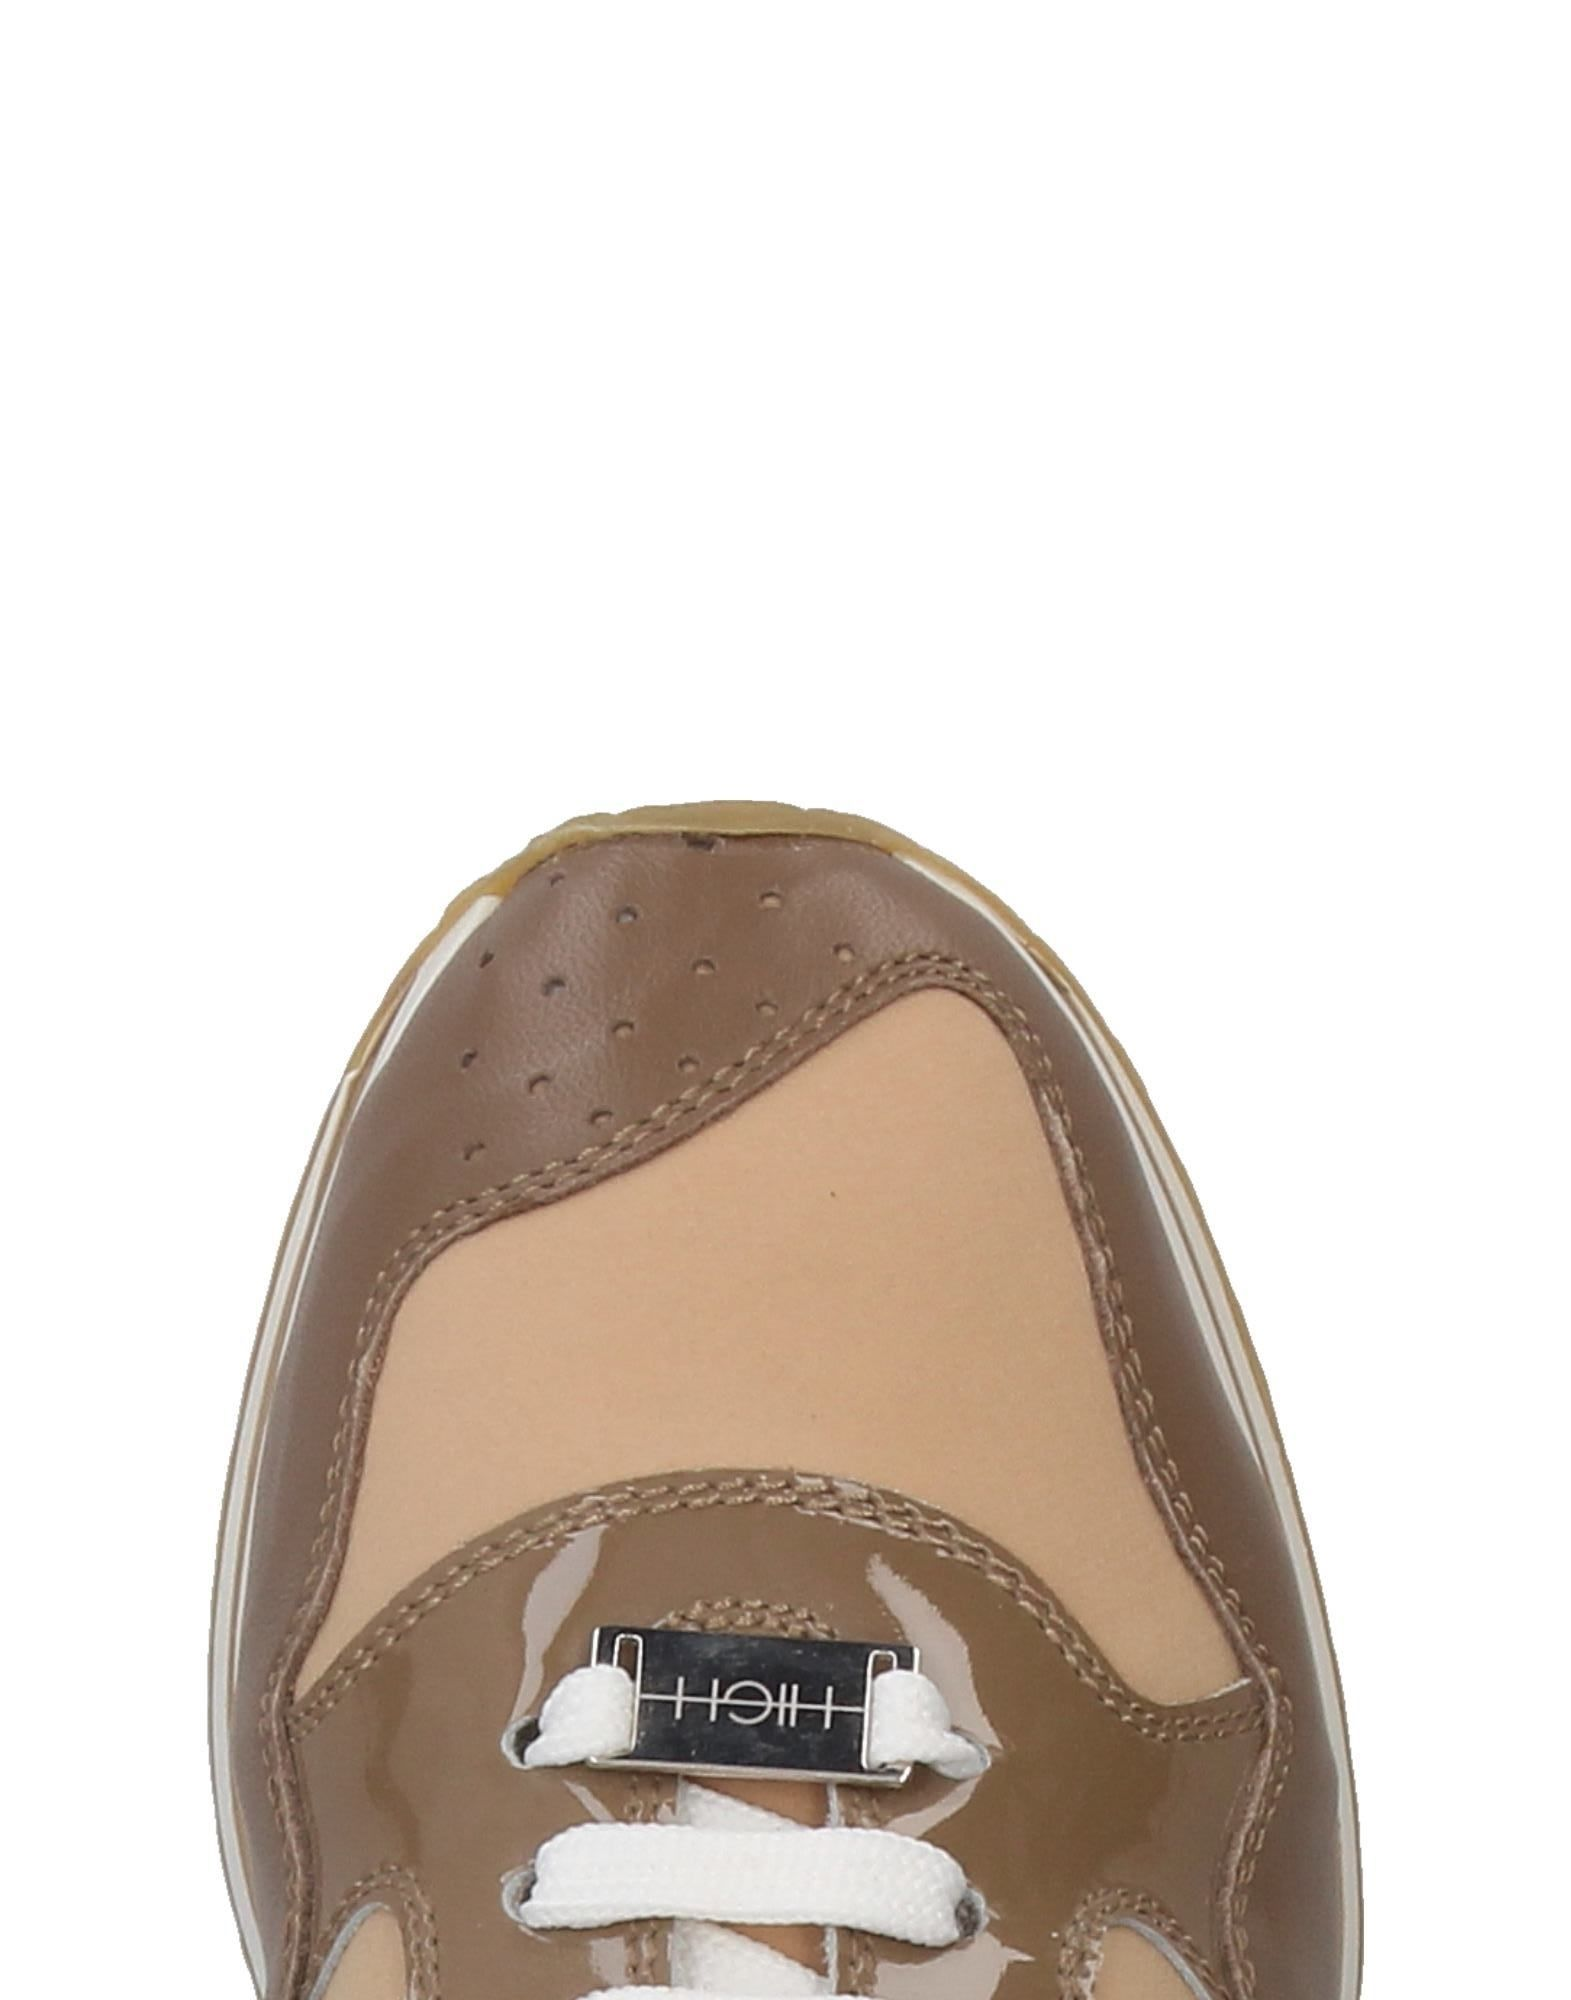 High Sneakers Damen  11397440DJGut aussehende Schuhe strapazierfähige Schuhe aussehende 3dc217